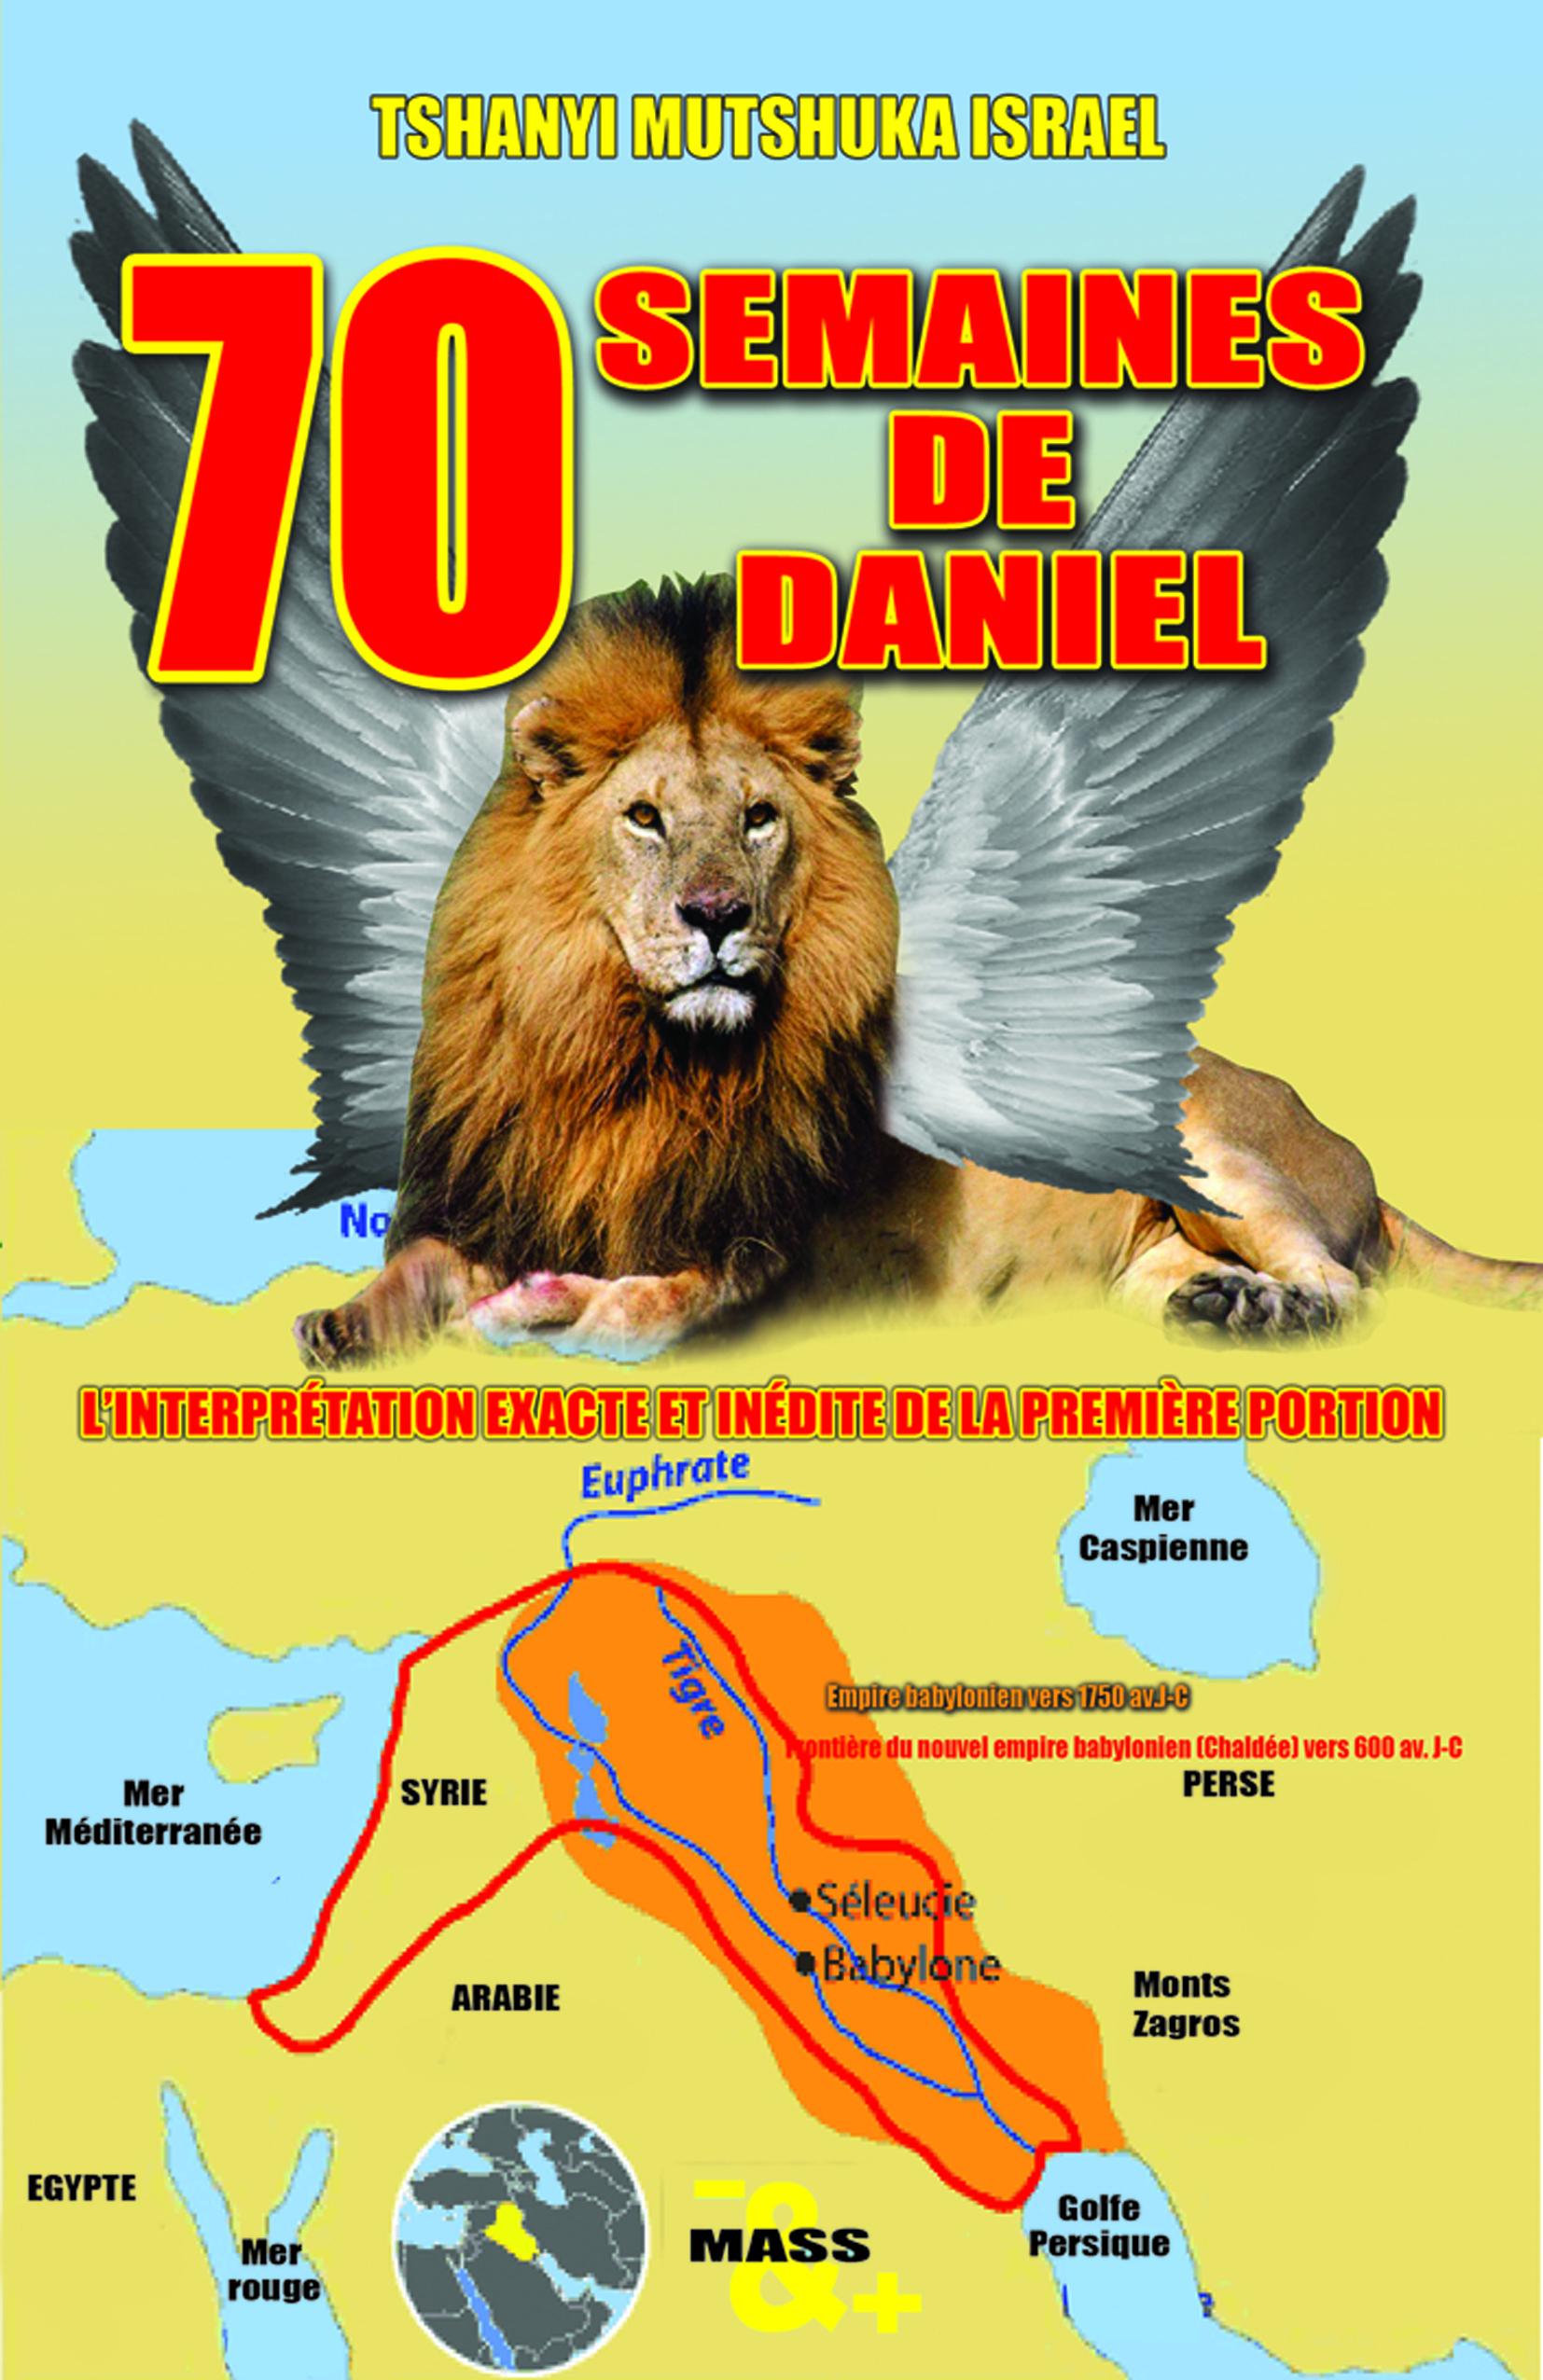 70 SEMAINES DE DANIEL - L'INTERPRETATION EXACTE ET INEDITE DE LA PREMIERE PORTION